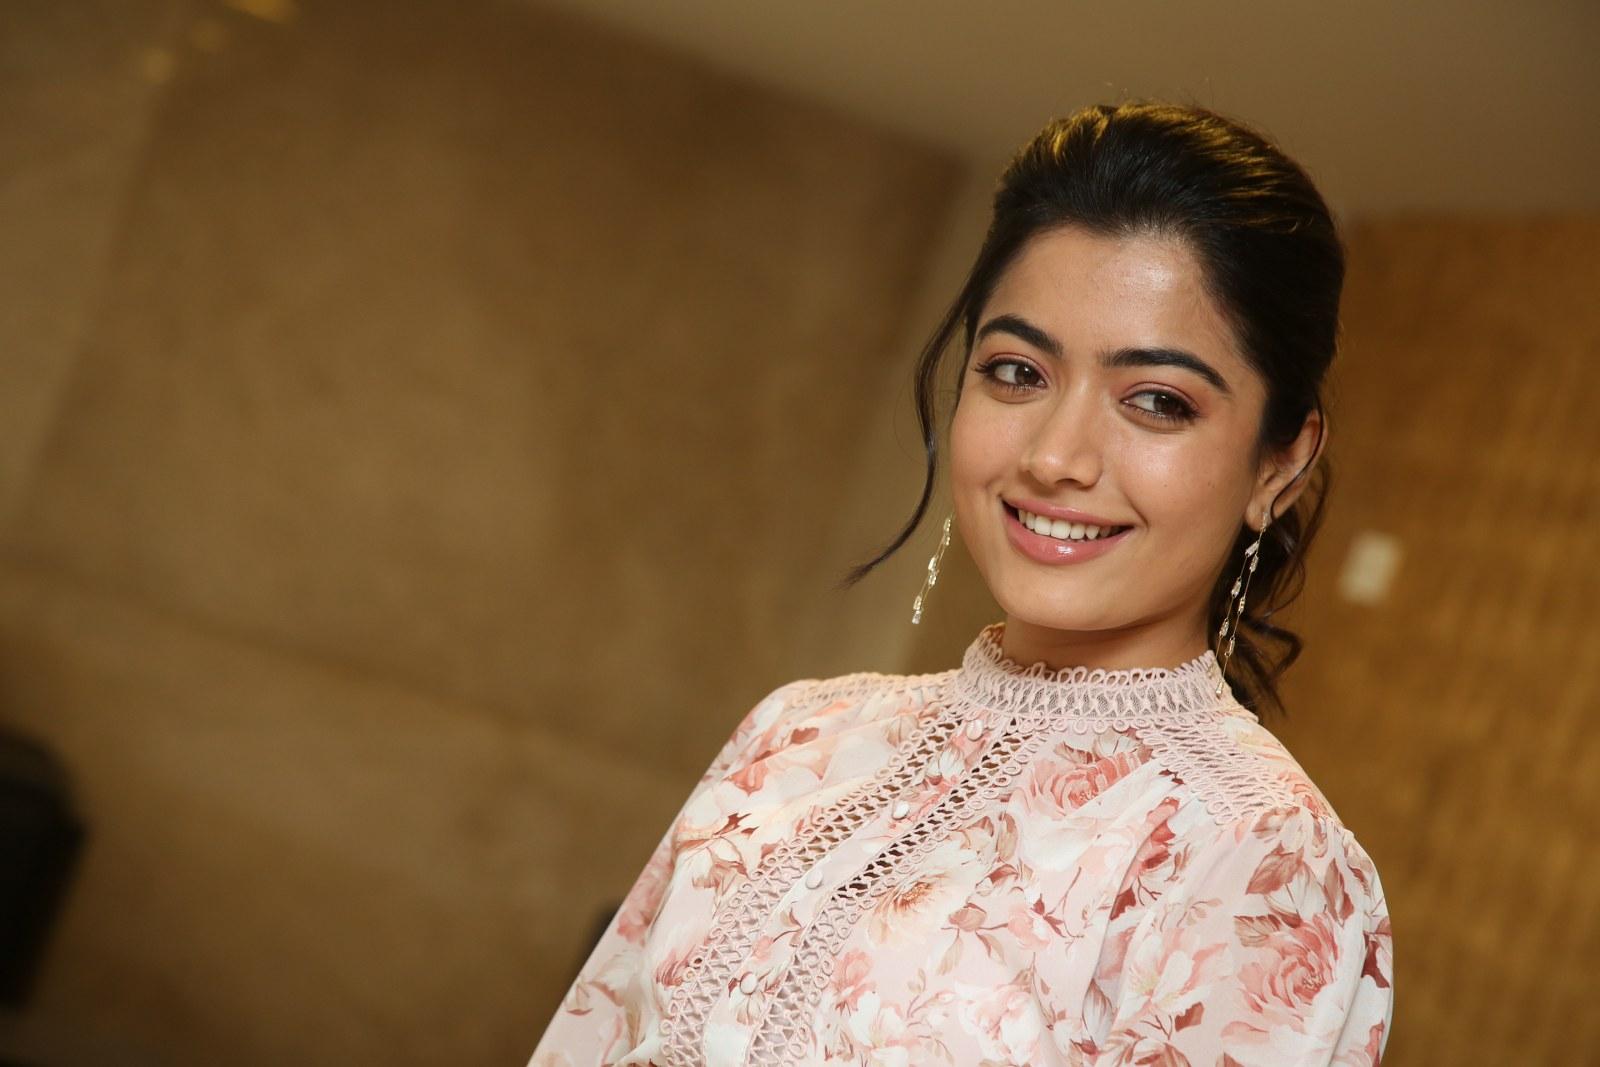 Photo of Rashmika Mandanna smily looks